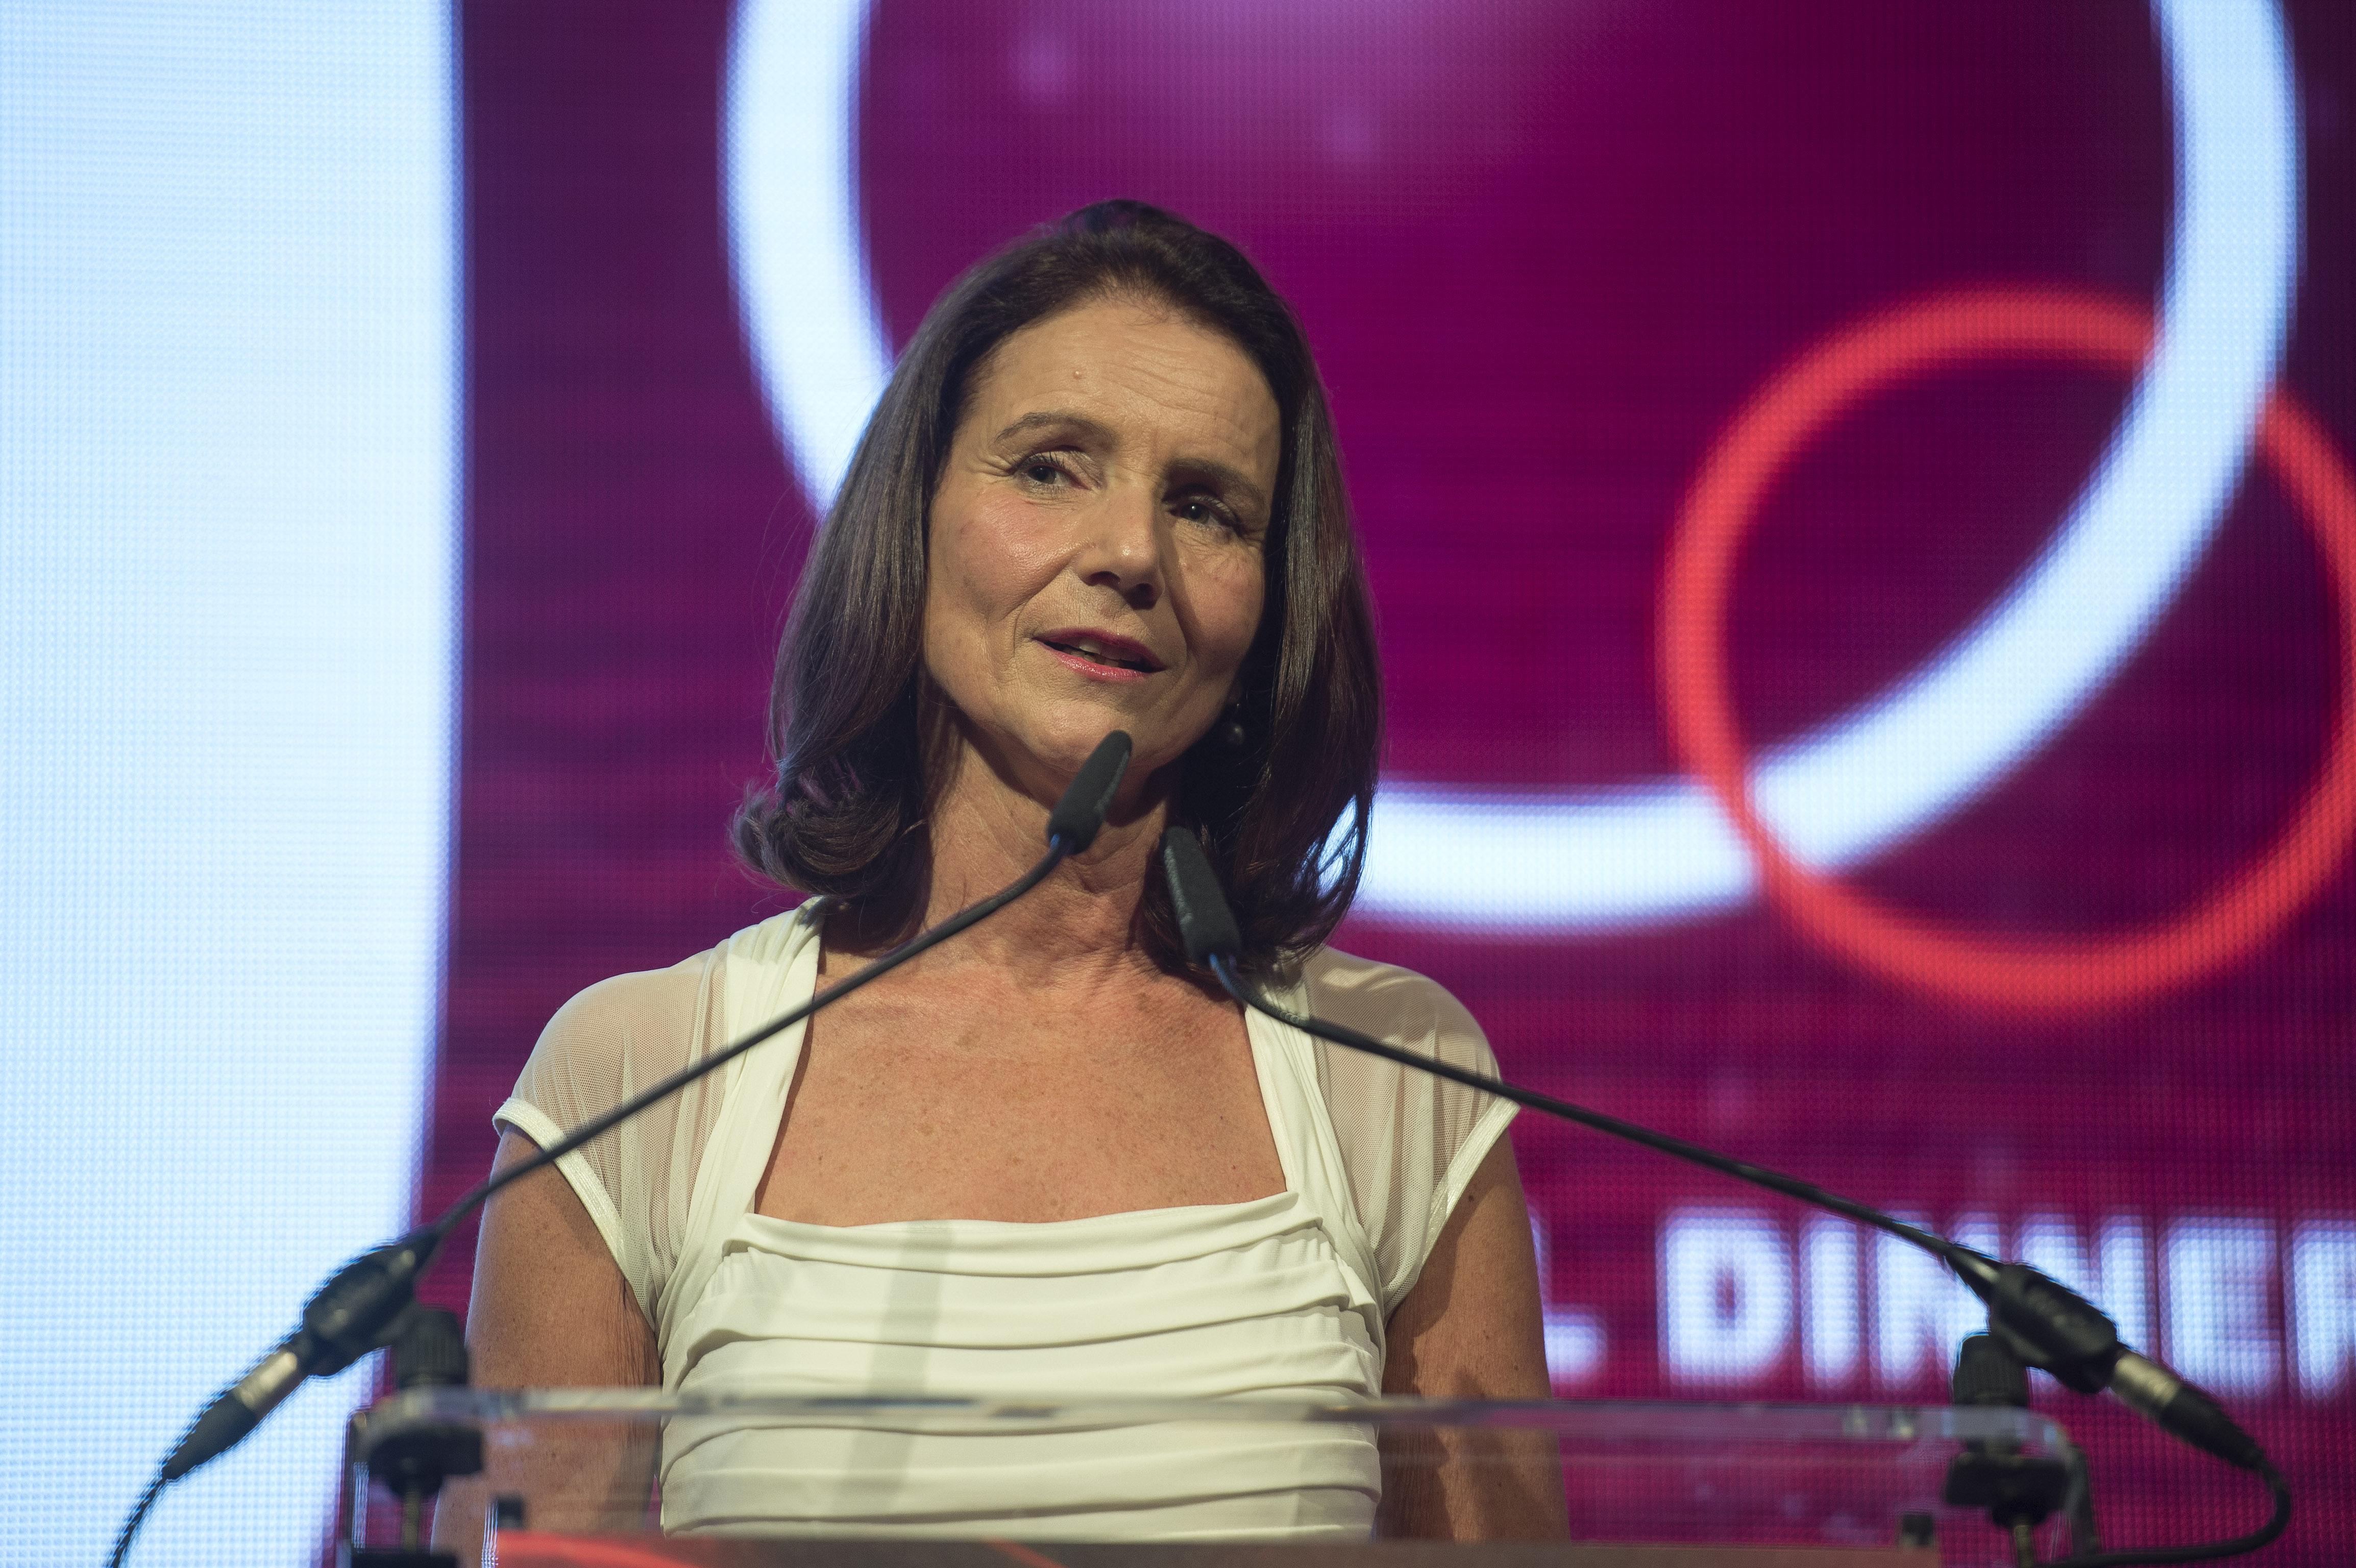 Carolyn Fairbarn is director general of the CBI